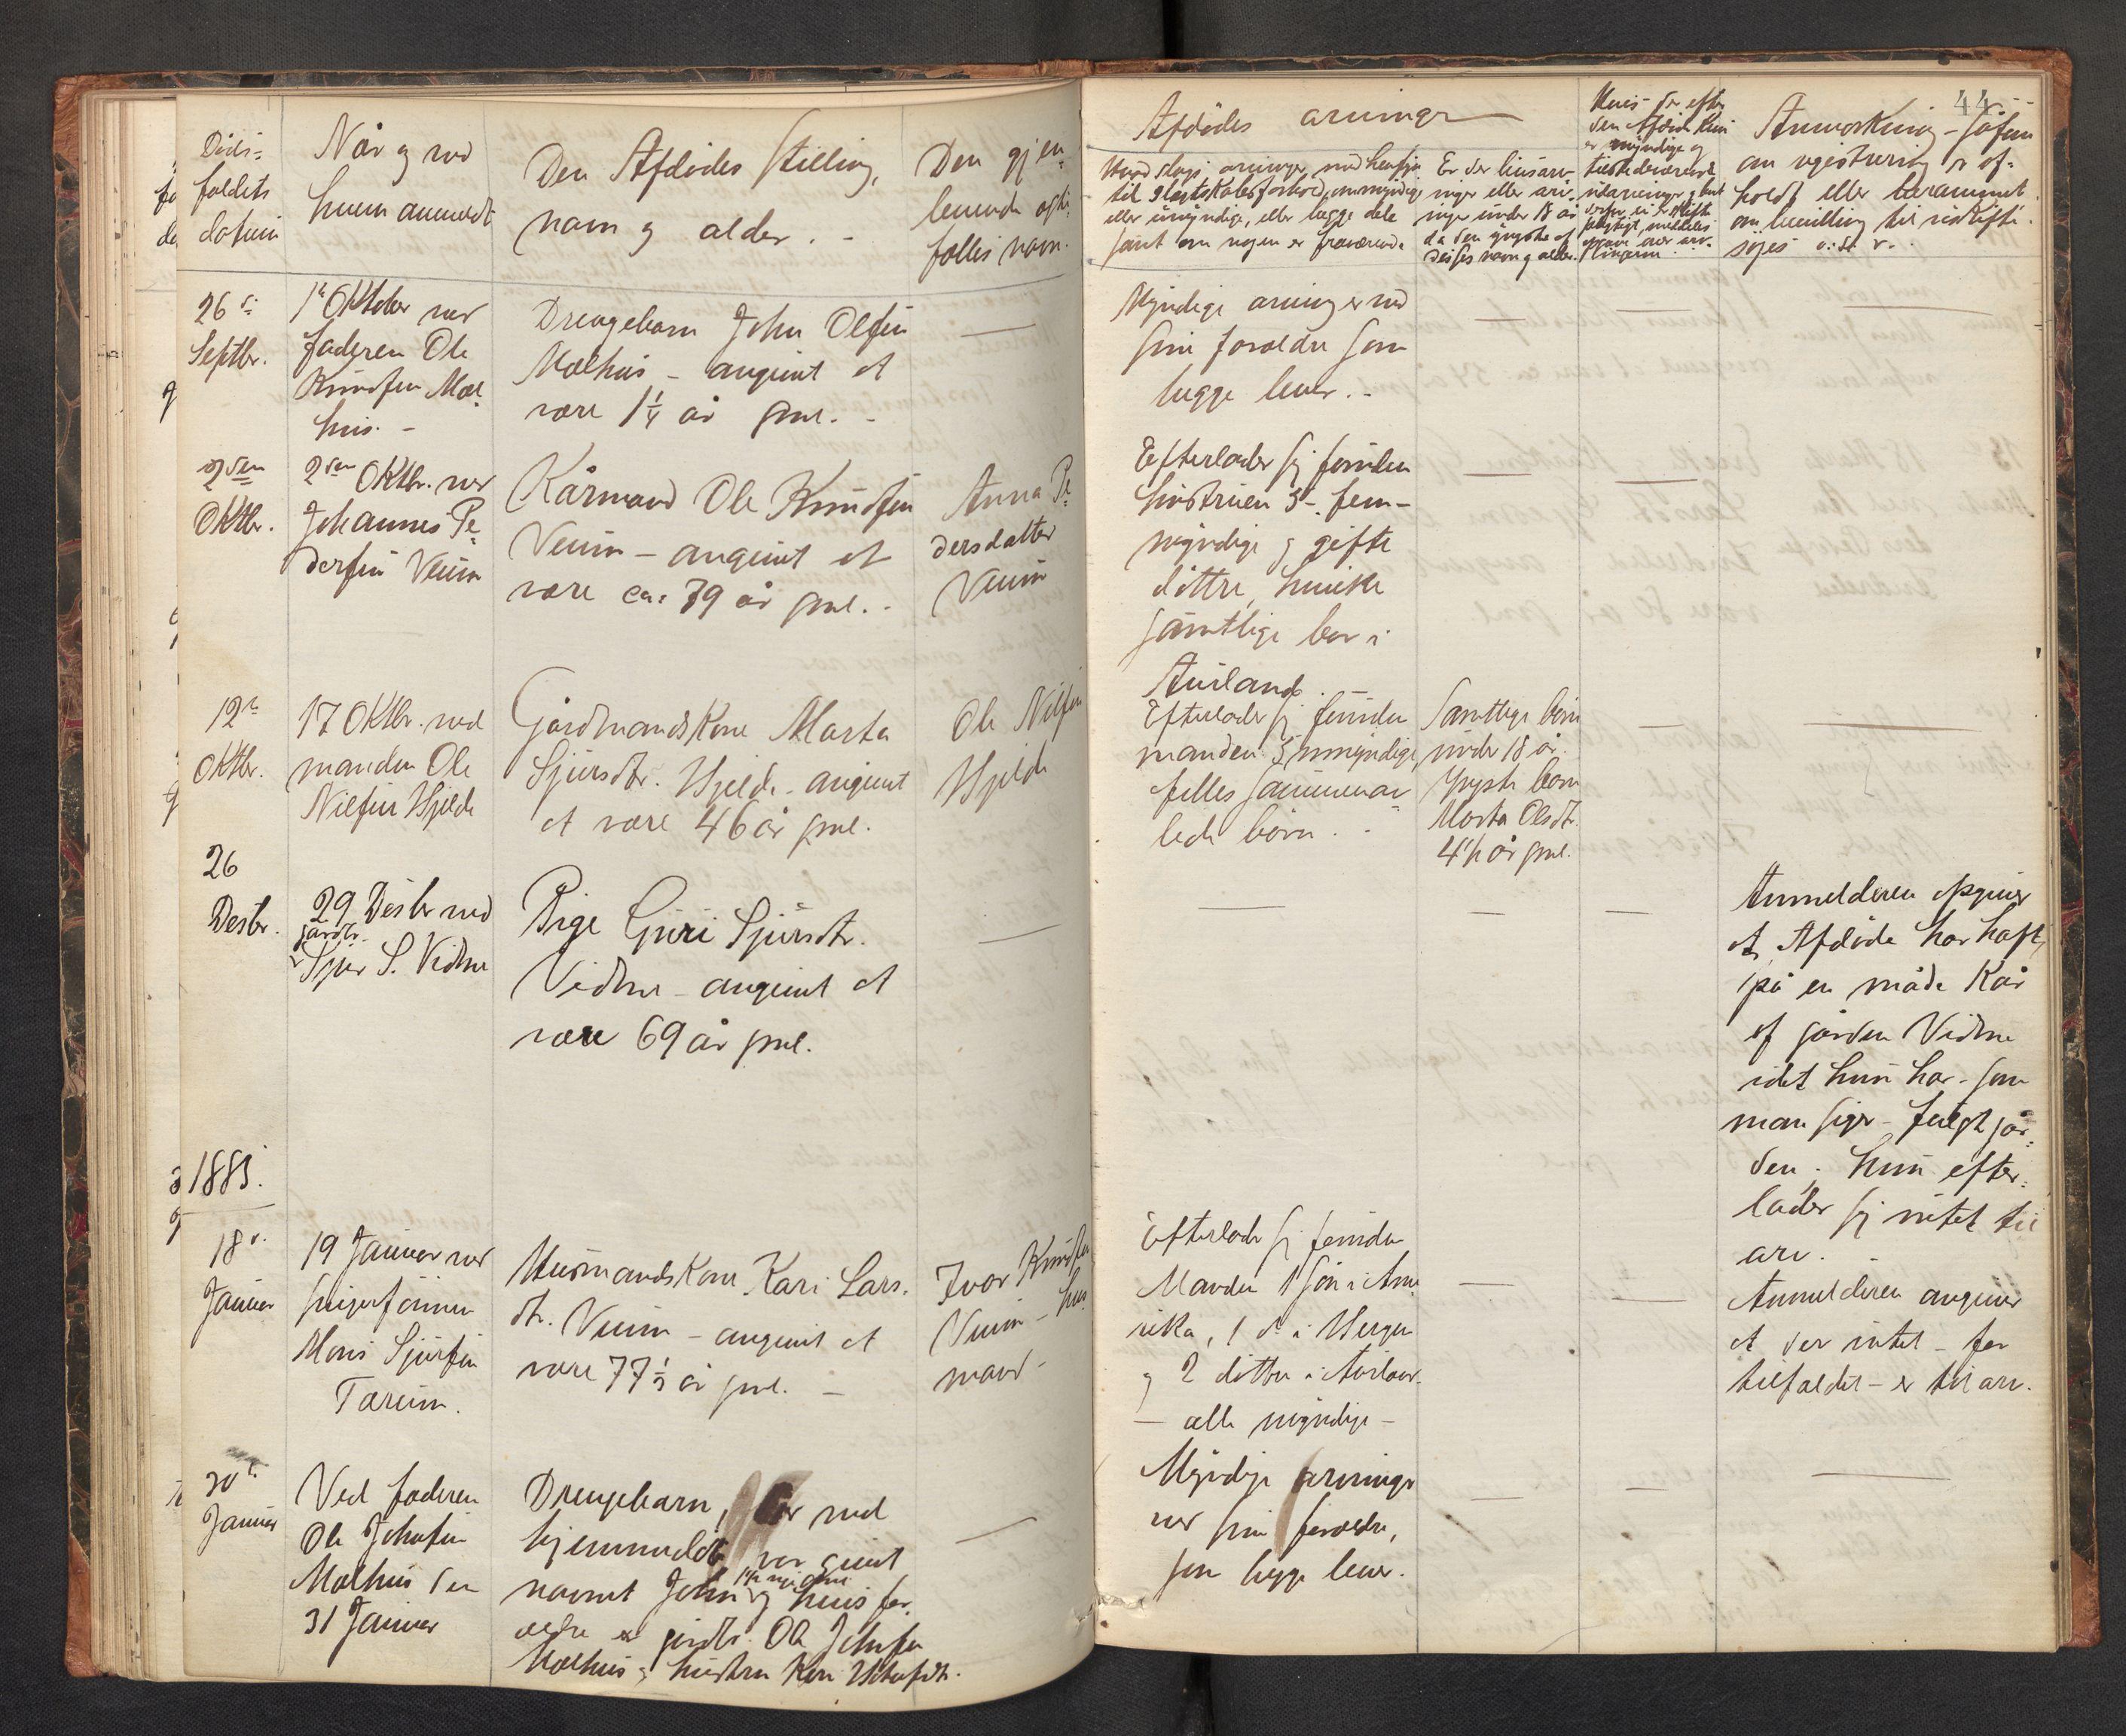 SAB, Lensmannen i Aurland, 0006/L0002: Dødsfallprotokoll, 1877-1892, s. 43b-44a